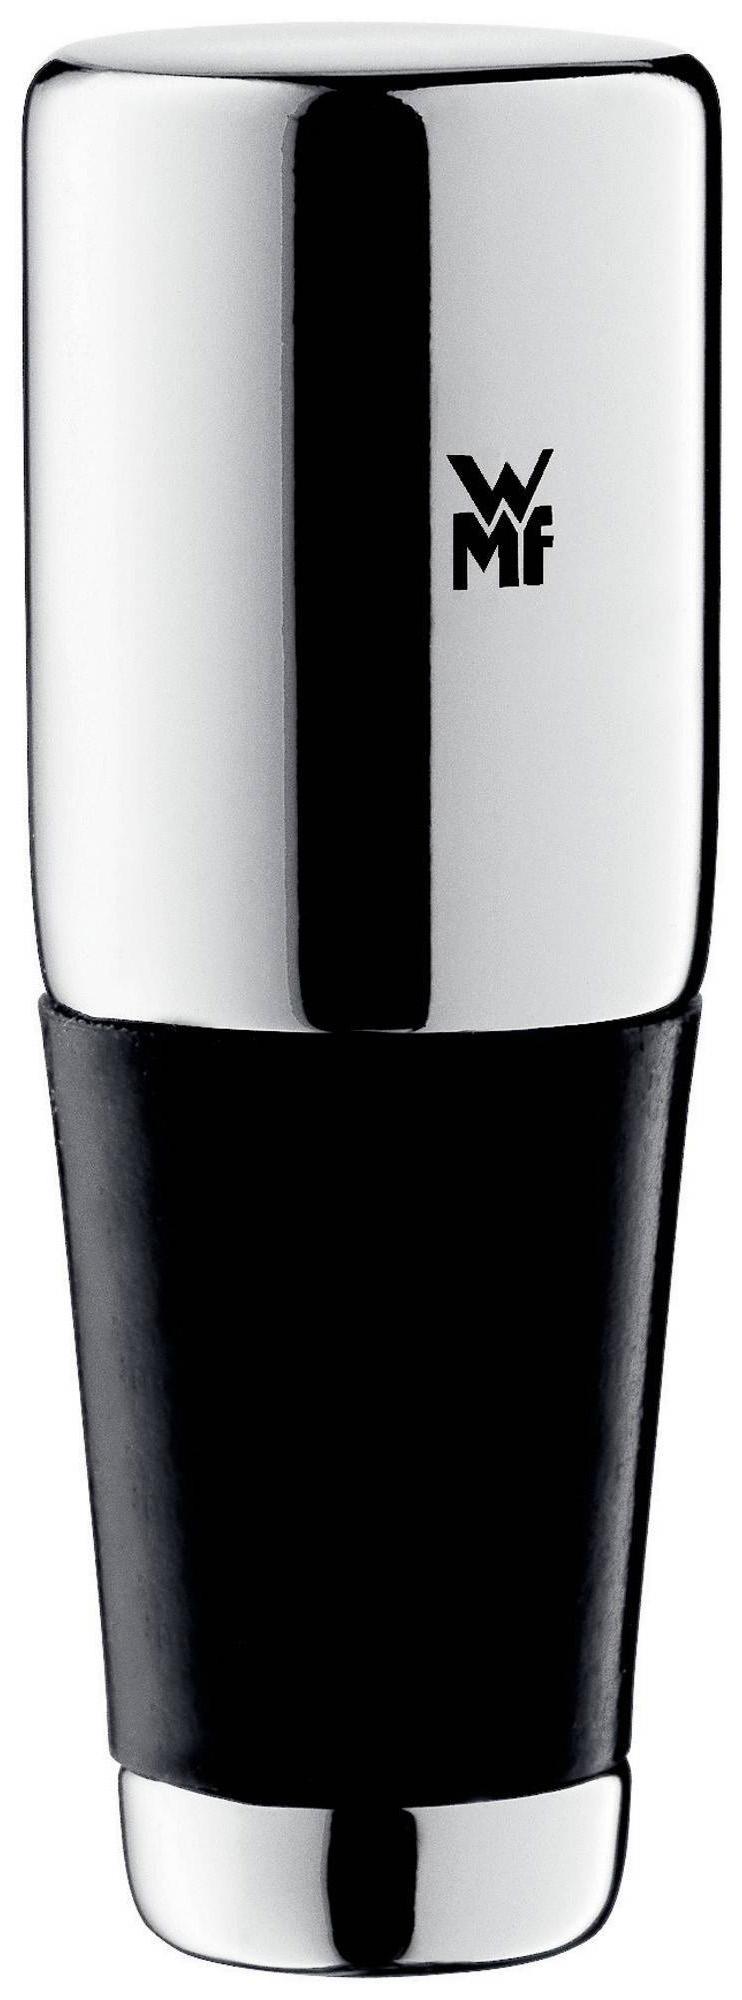 Пробка для бутылок WMF Vino 0640727920